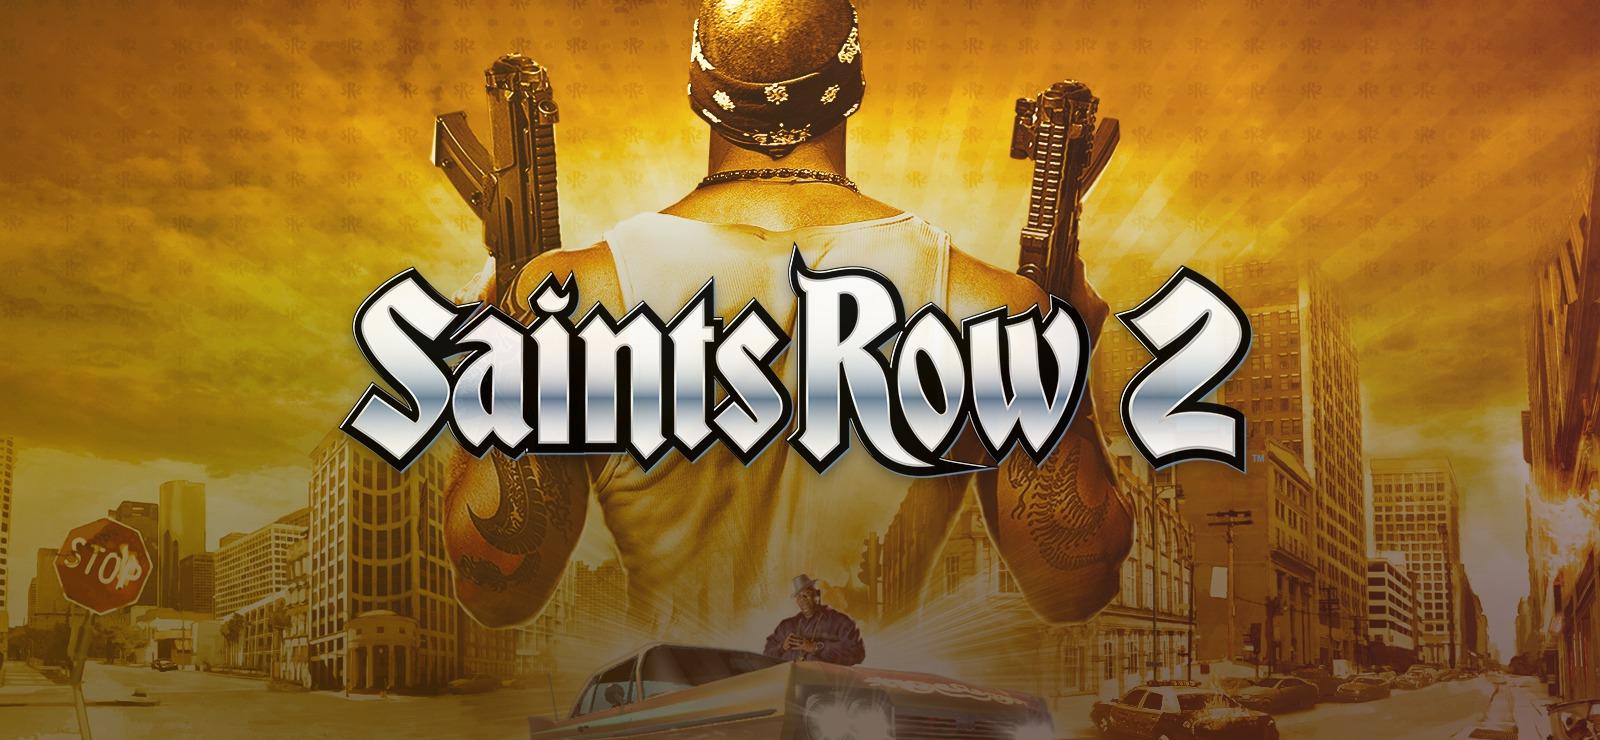 Saints Row 2 is here to f&$@ up Xbox One backward compatibility screenshot